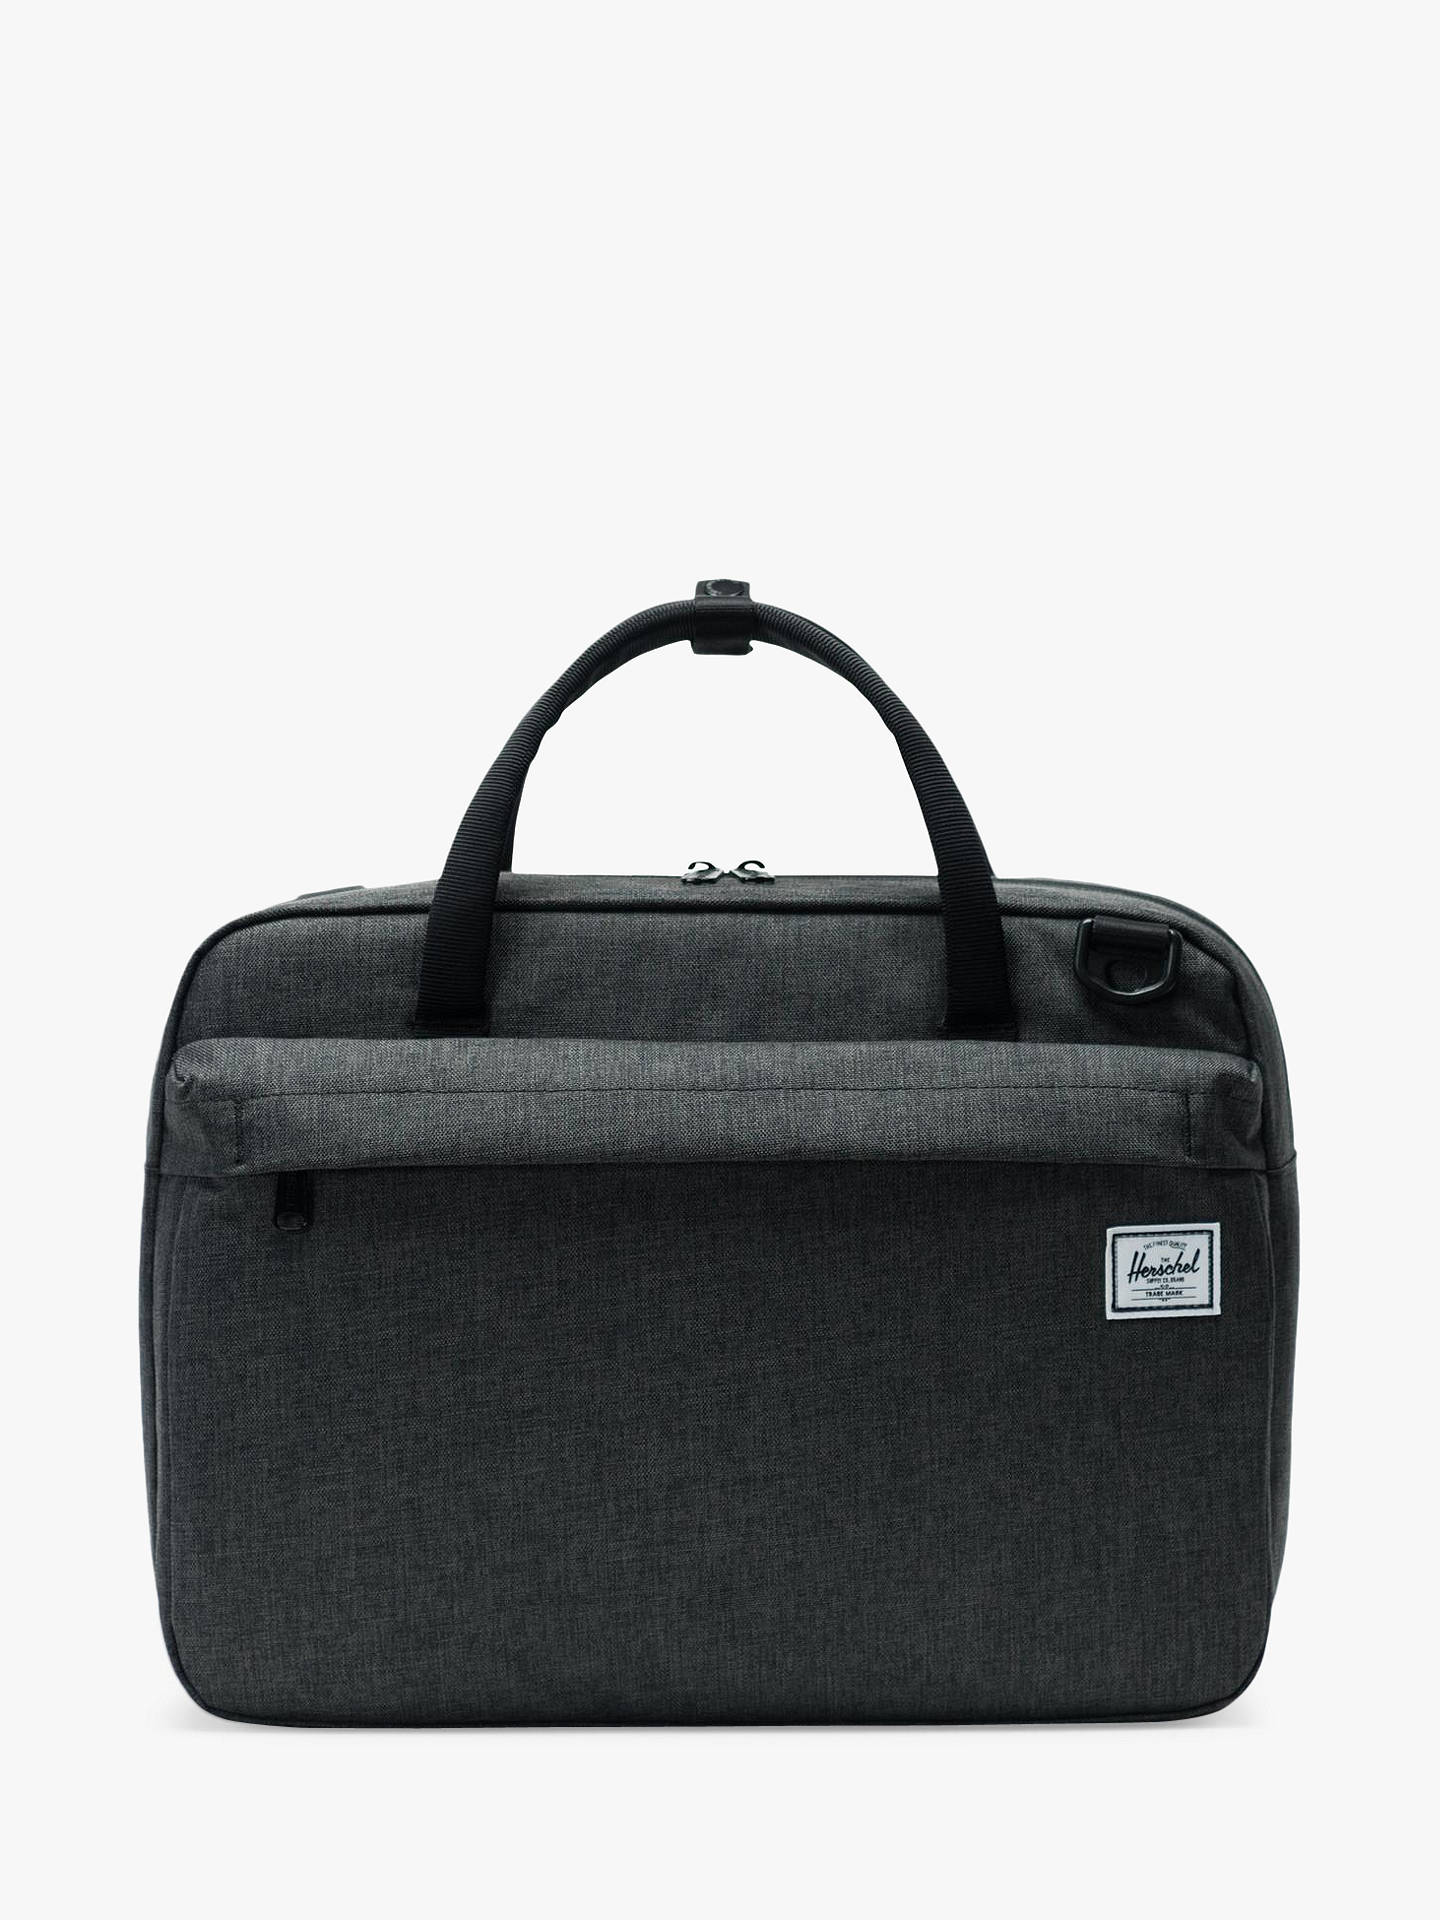 05fc4ba364f1 Buy Herschel Supply Co. Gibson Messenger Bag